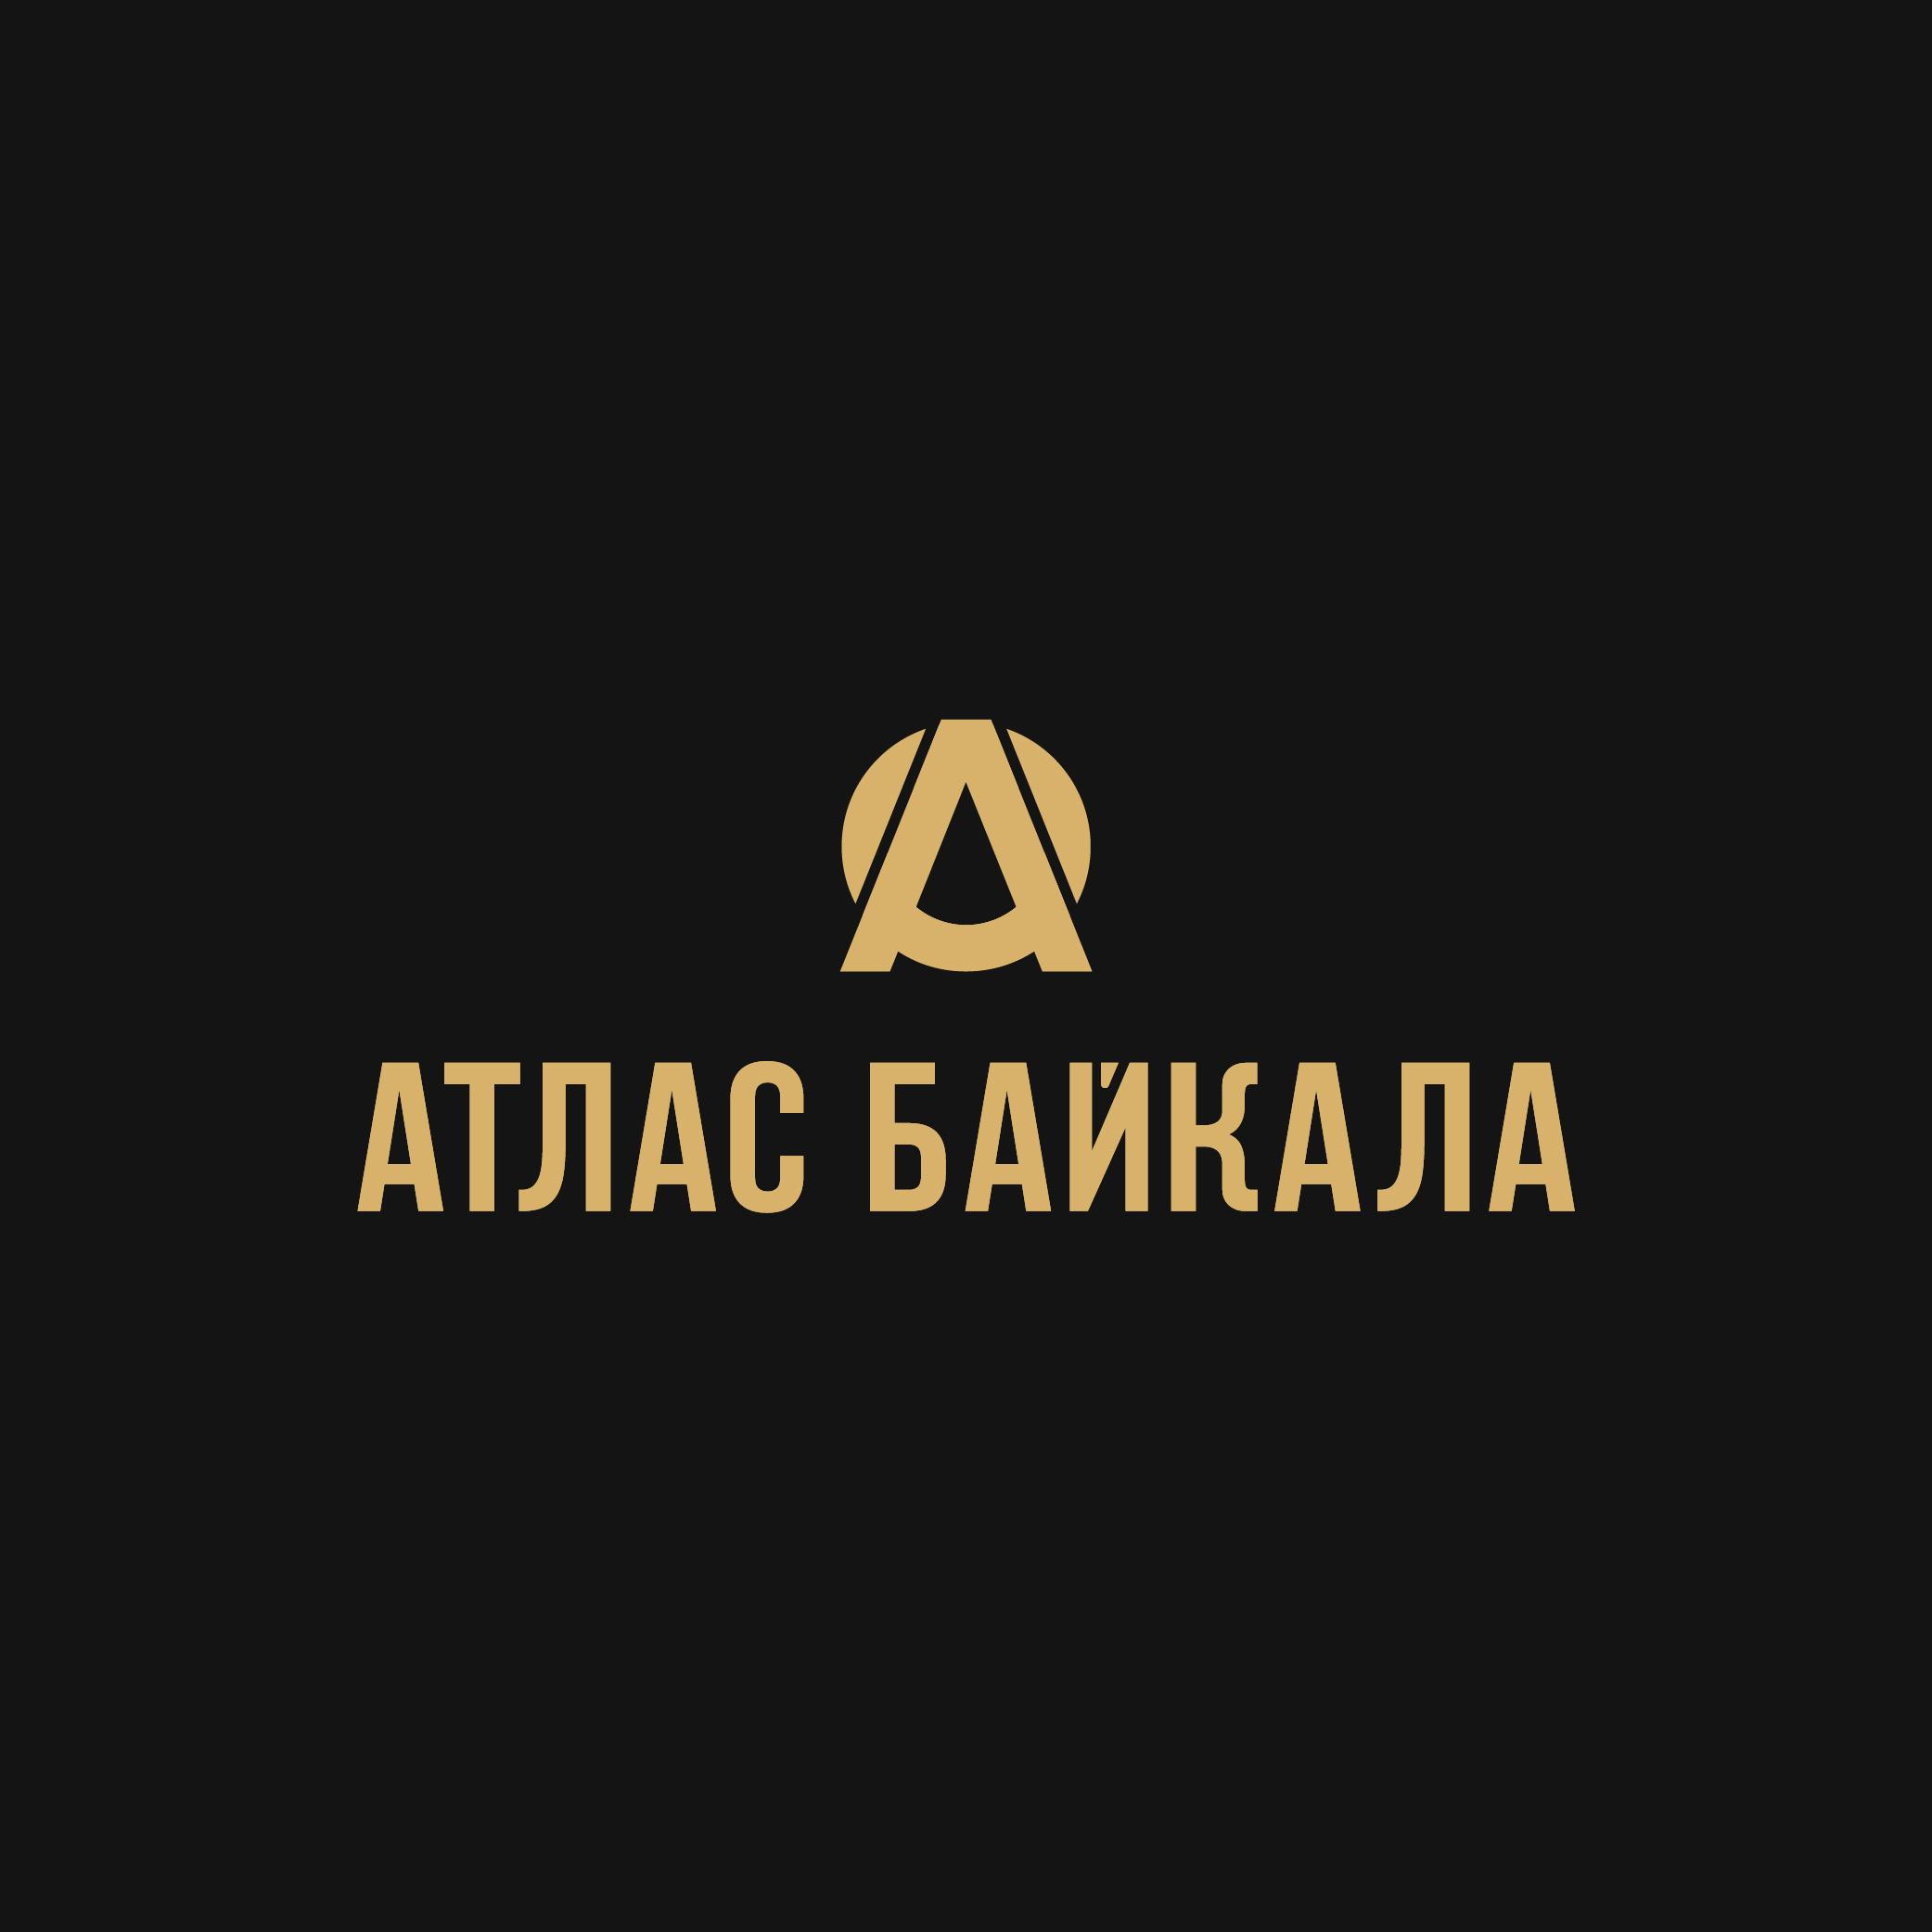 Разработка логотипа Атлас Байкала фото f_4045afc8d62a0937.jpg